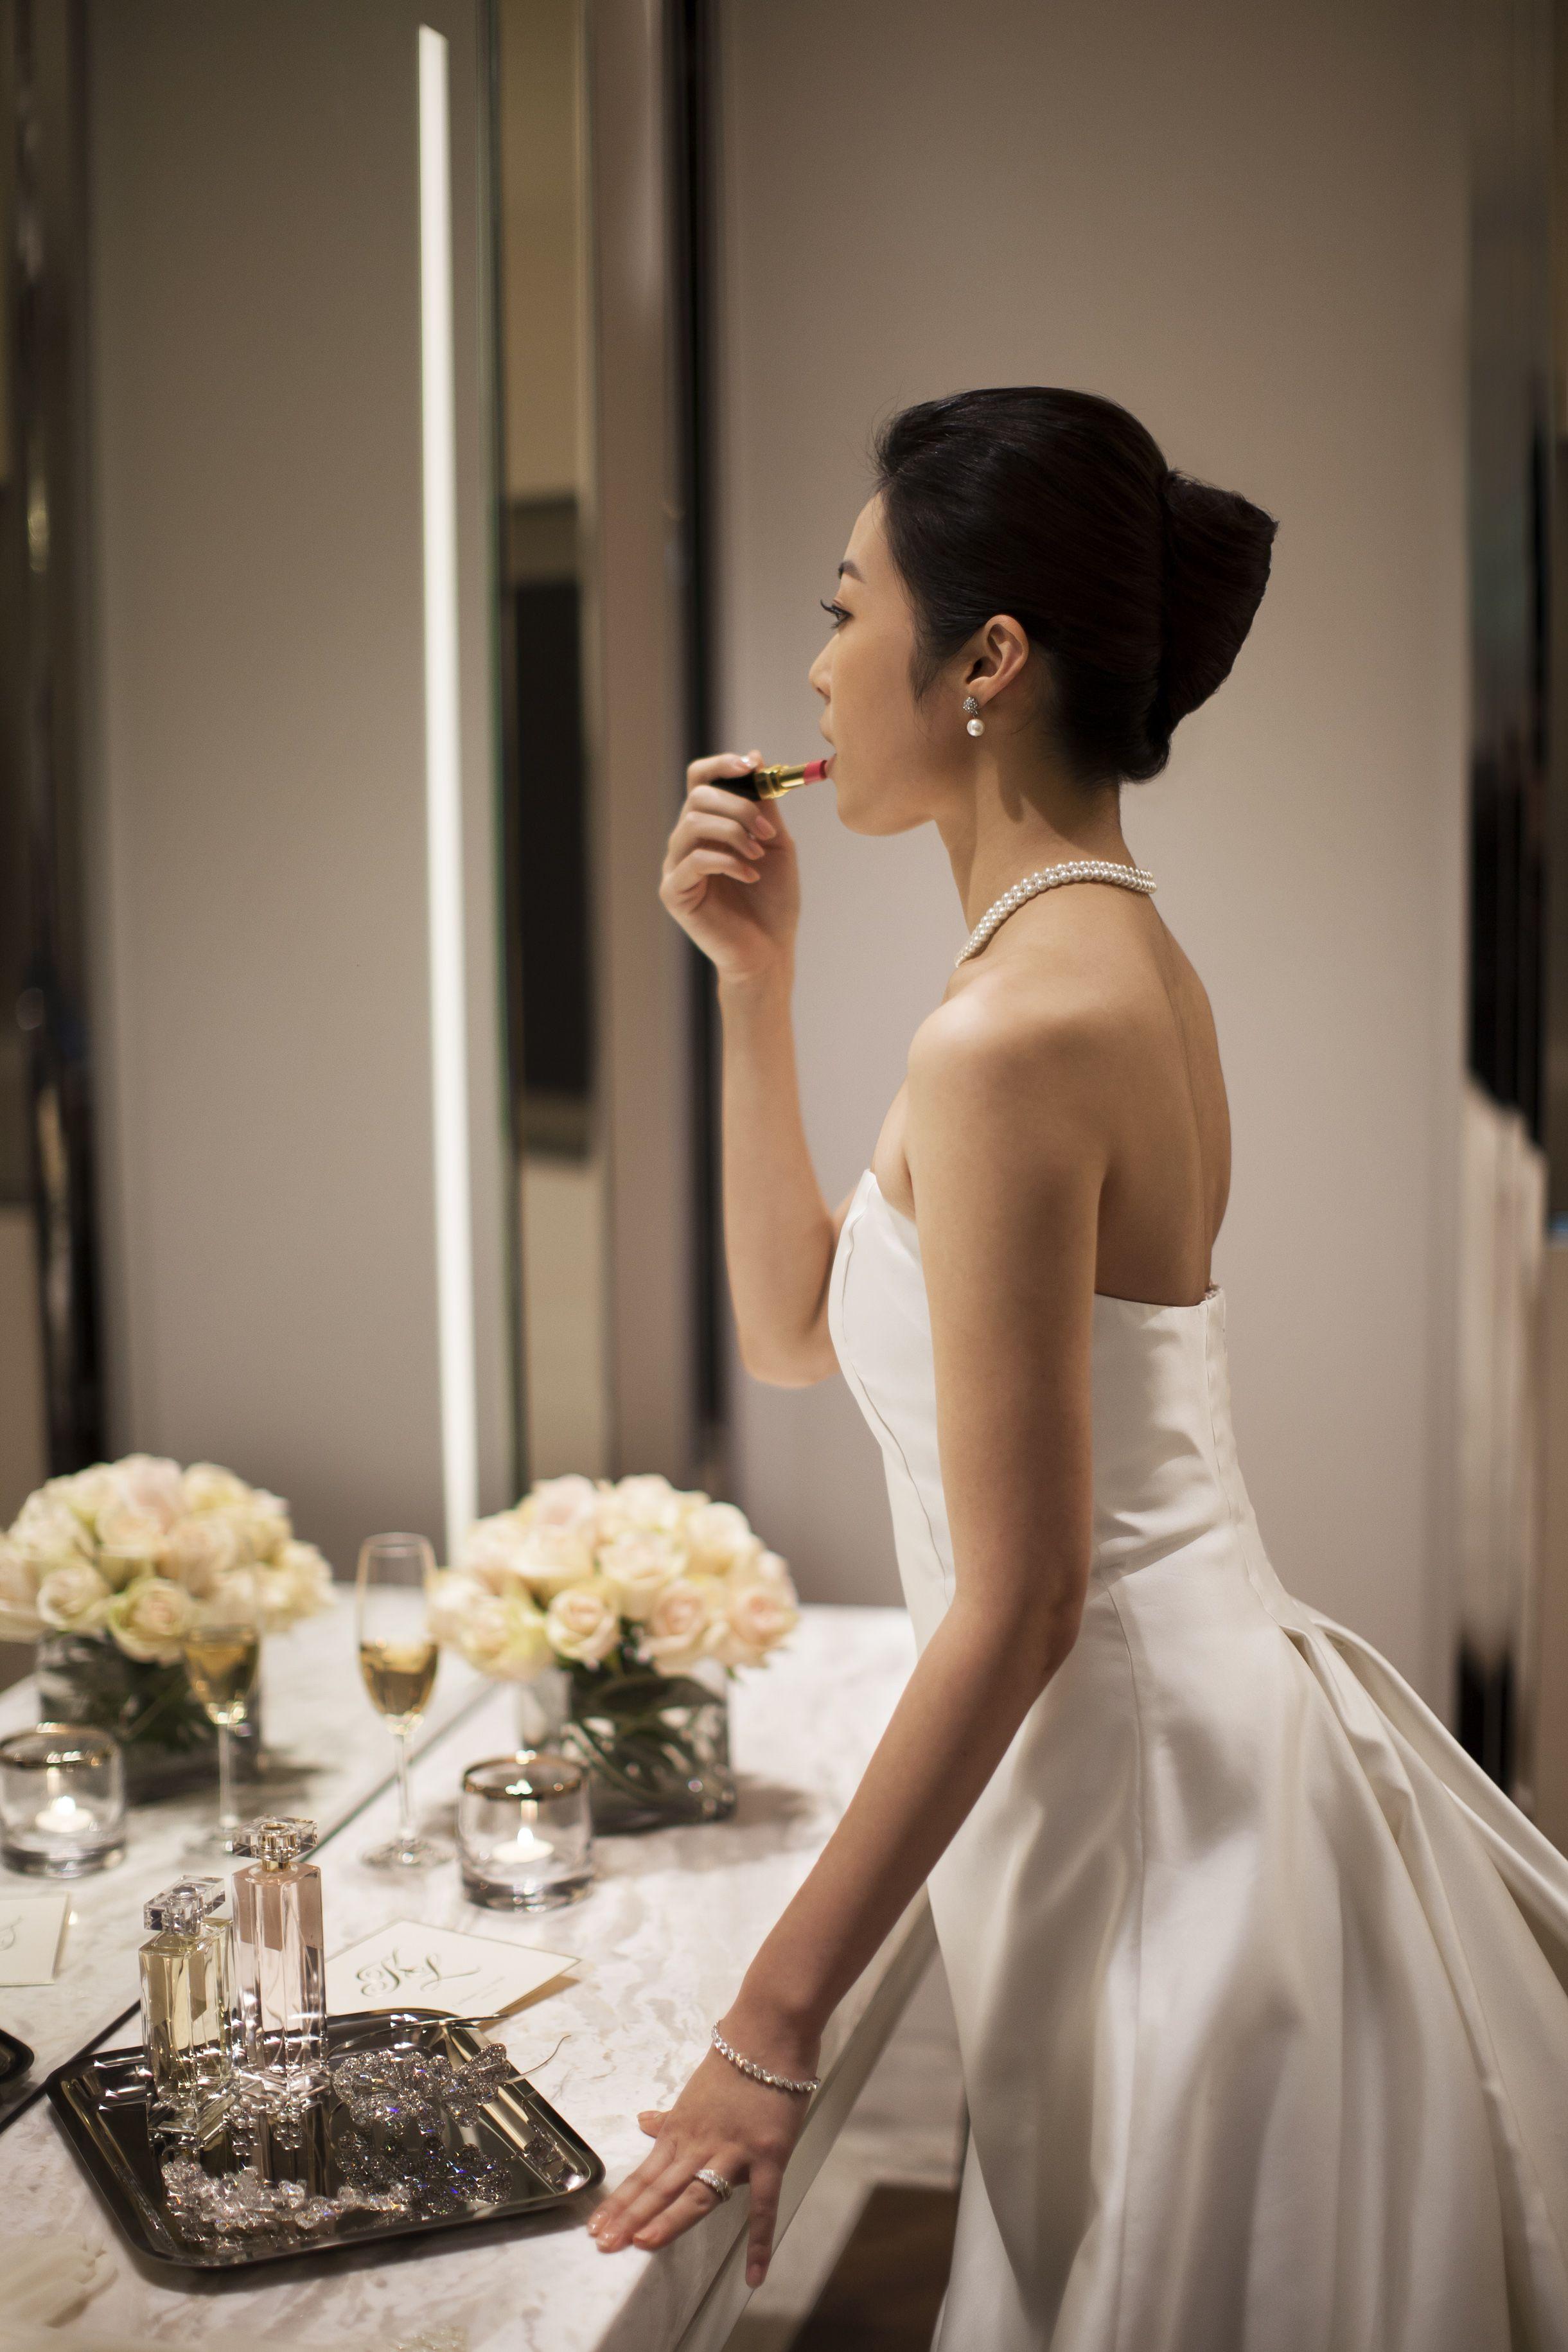 Jw Mdss Bridal Room 2 Bridal Dresses Wedding Bridal Luxurious bridal room pictures